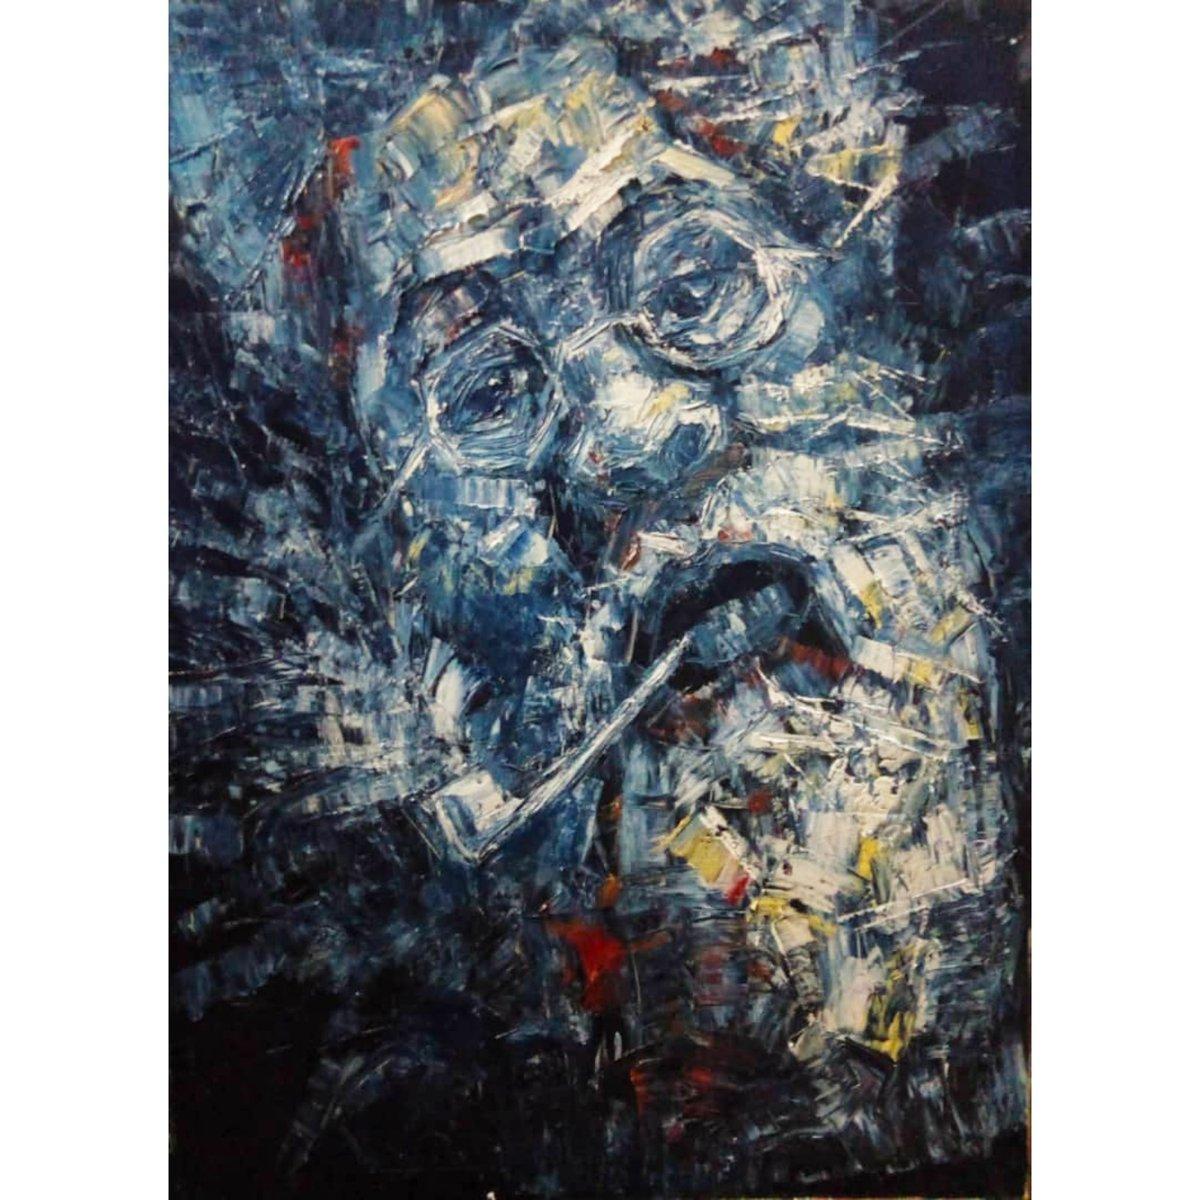 𝑻𝒉𝒊𝒔 𝒘𝒆𝒆𝒌 𝒕𝒂𝒌𝒆 𝒄𝒉𝒂𝒓𝒈𝒆 𝒂𝒏𝒅 𝒃𝒆 a 𝑩𝒐𝒔𝒔! 😉. 𝟰𝗳𝘁. 𝘅 𝟯𝗙𝘁. #AcryliconCanvas #painting 𝒇𝒓𝒐𝒎 𝒐𝒖𝒓 '𝐋𝐢𝐤𝐞 𝐒𝐡𝐚𝐫𝐝𝐬 𝐨𝐟 𝐆𝐥𝐚𝐬𝐬' #collection 𝑎𝑣𝑎𝑖𝑙𝑎𝑏𝑙𝑒 𝘢𝘵 𝑇𝐻𝐸 𝐴𝐹𝐹𝑂𝑅𝐷𝐴𝐵𝐿𝐸 𝐴𝑅𝑇 𝑆𝐻𝑂𝑃.  #contemporaryart #Art #lagos